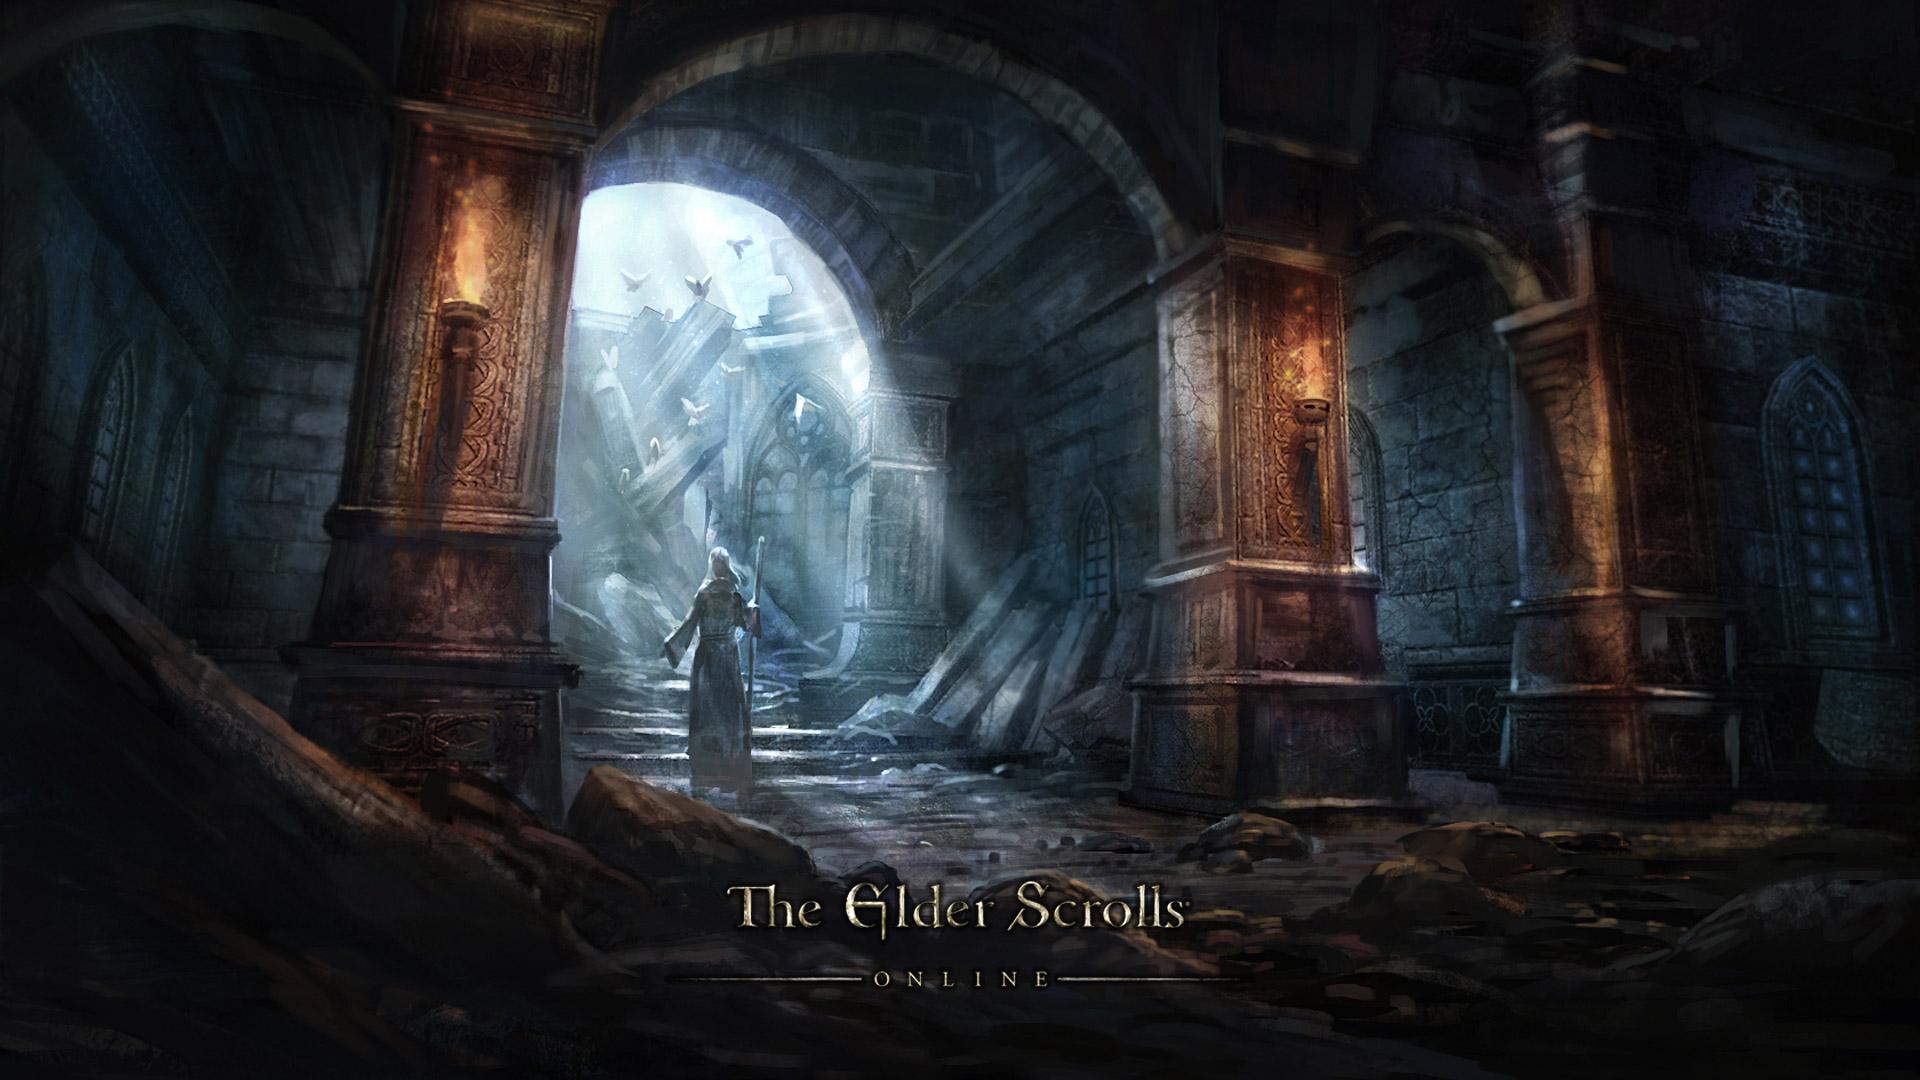 The Elder Scrolls Online Wallpaper in 1920x1080